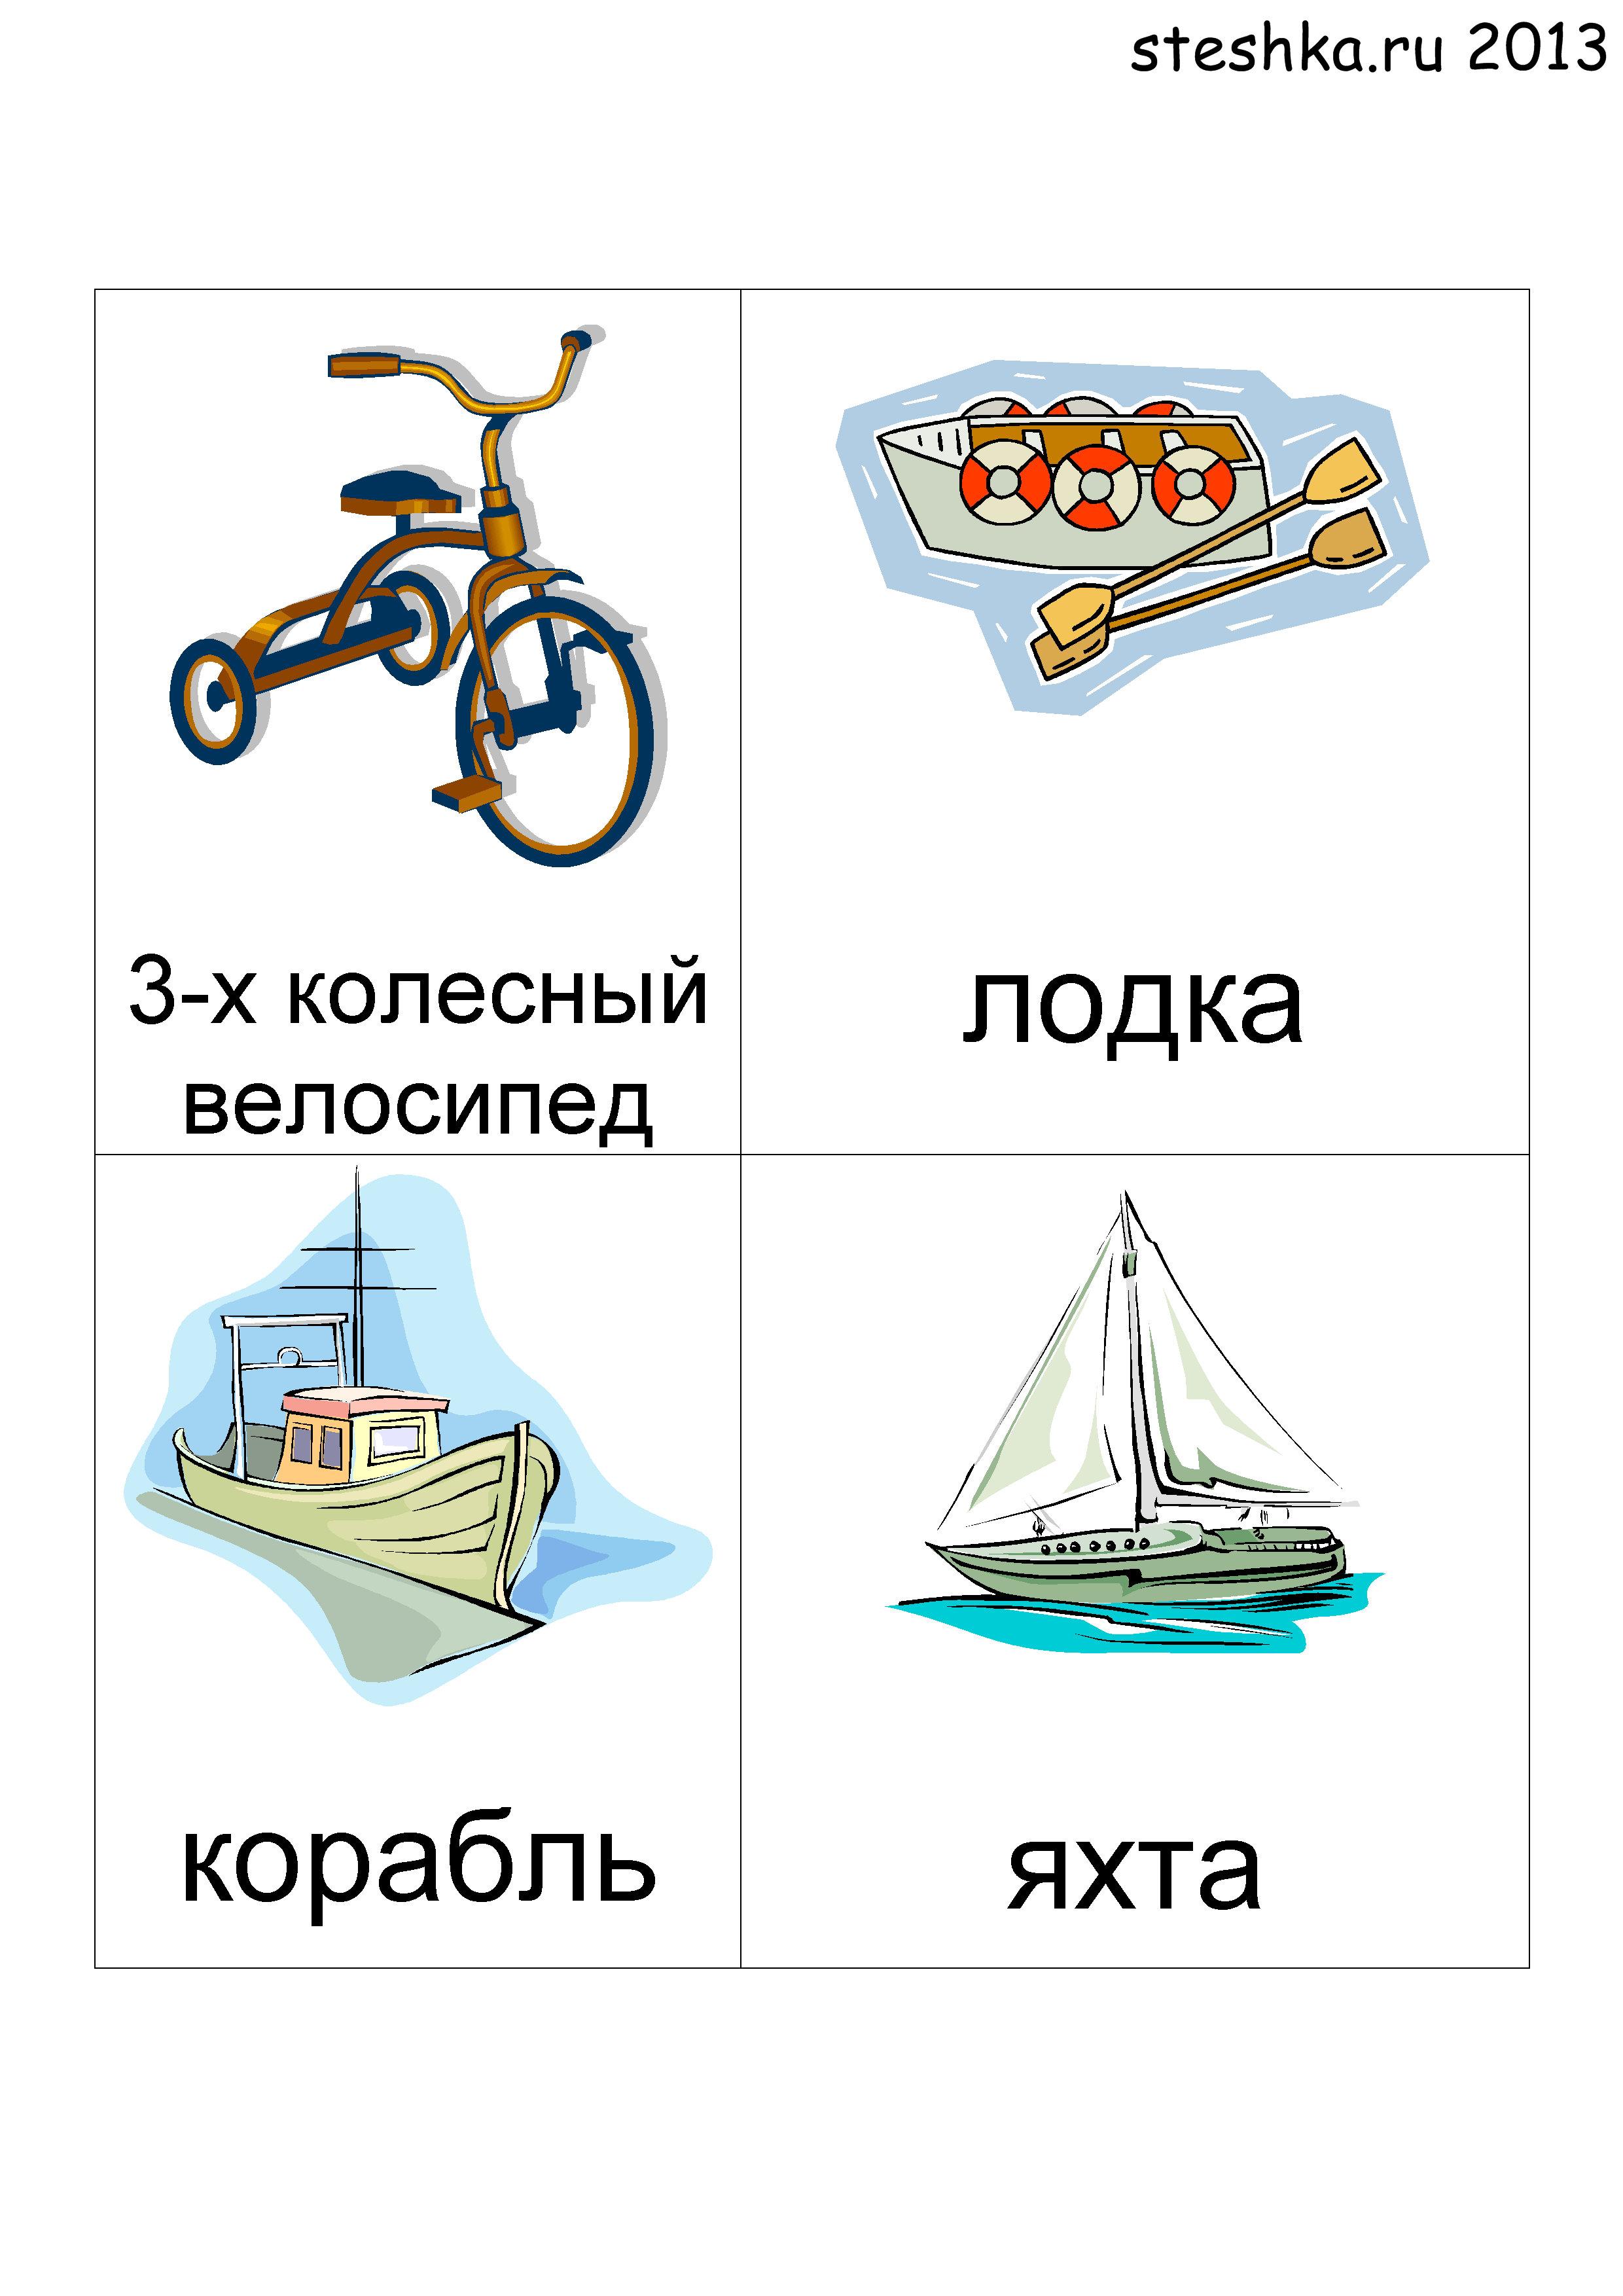 Что на картинке лишнее лодка велосипед